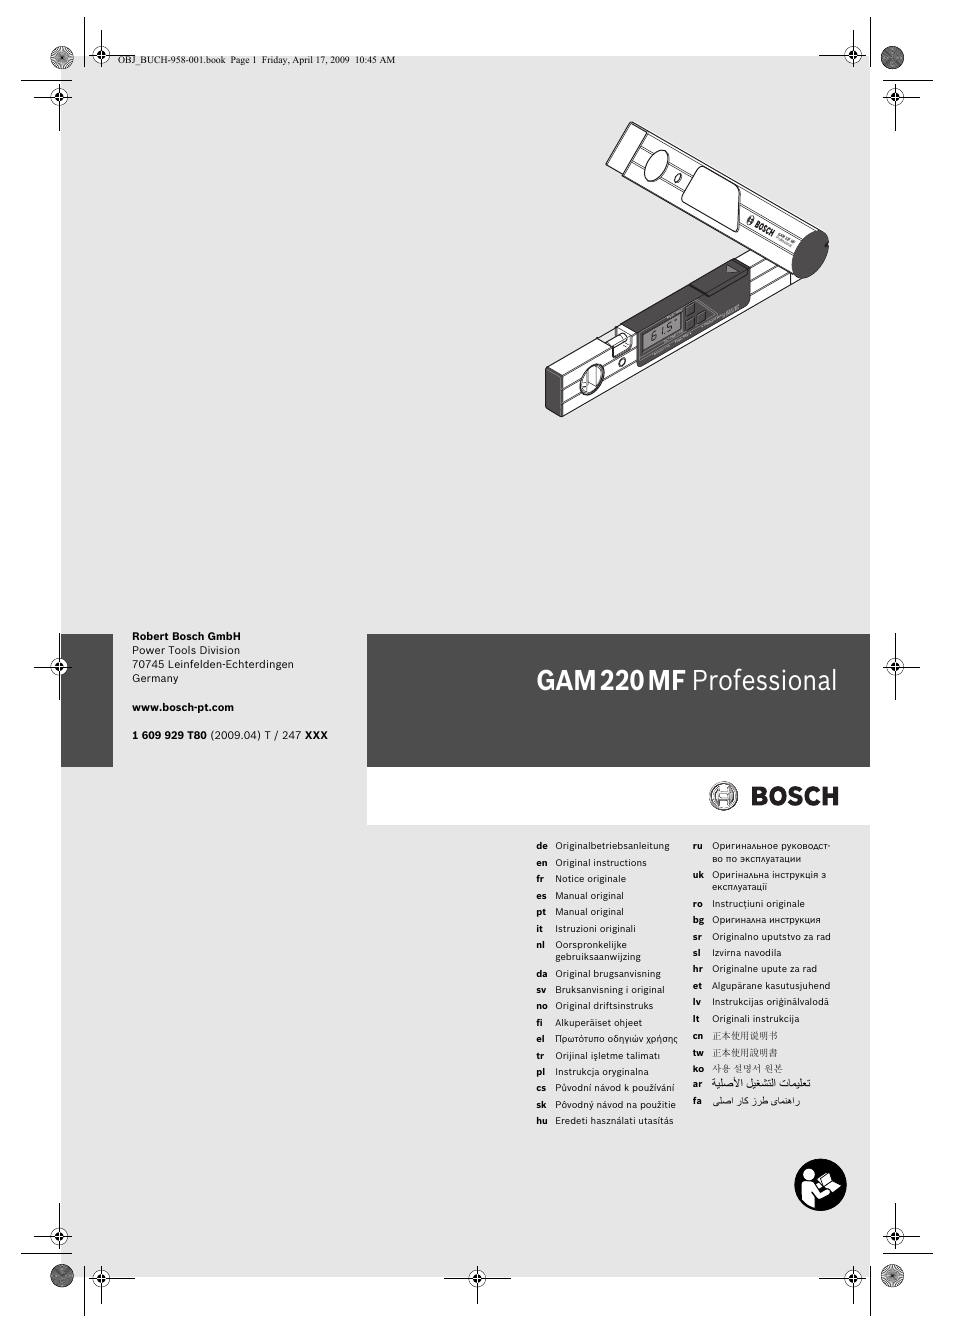 bosch gam 220 mf manual